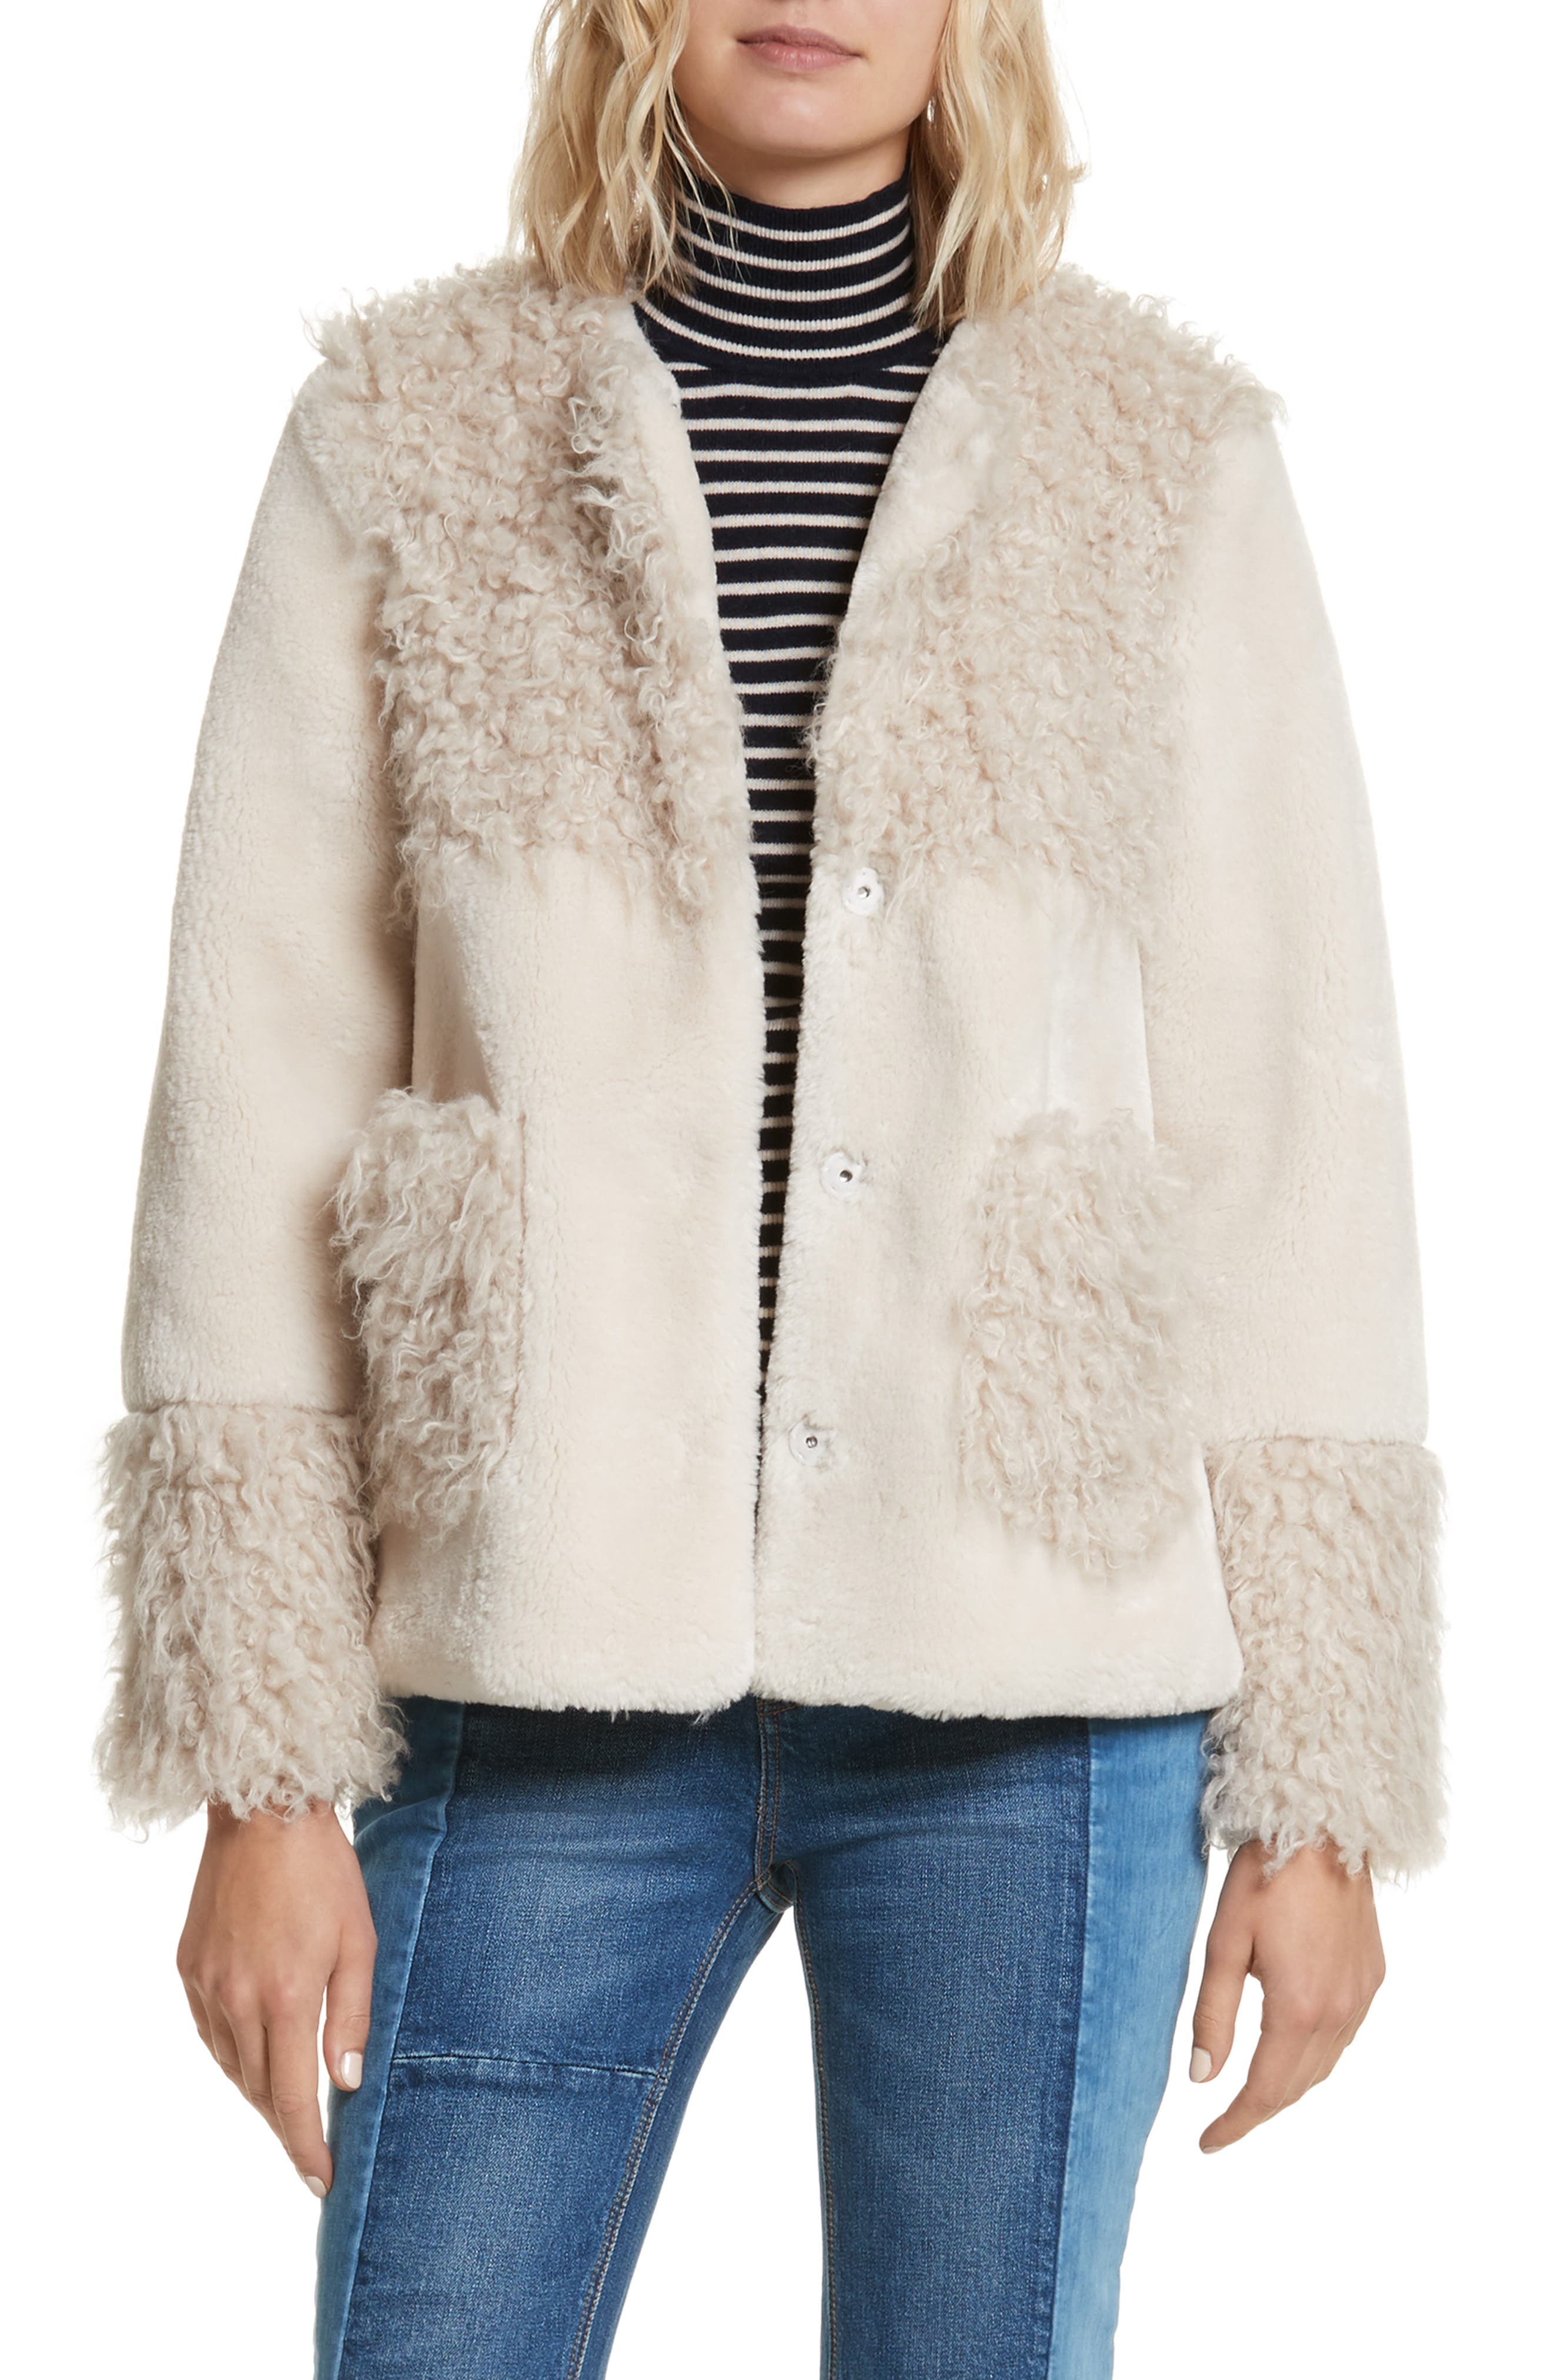 Alternate Image 1 Selected - La Vie Rebecca Taylor Mixed Faux Fur Coat